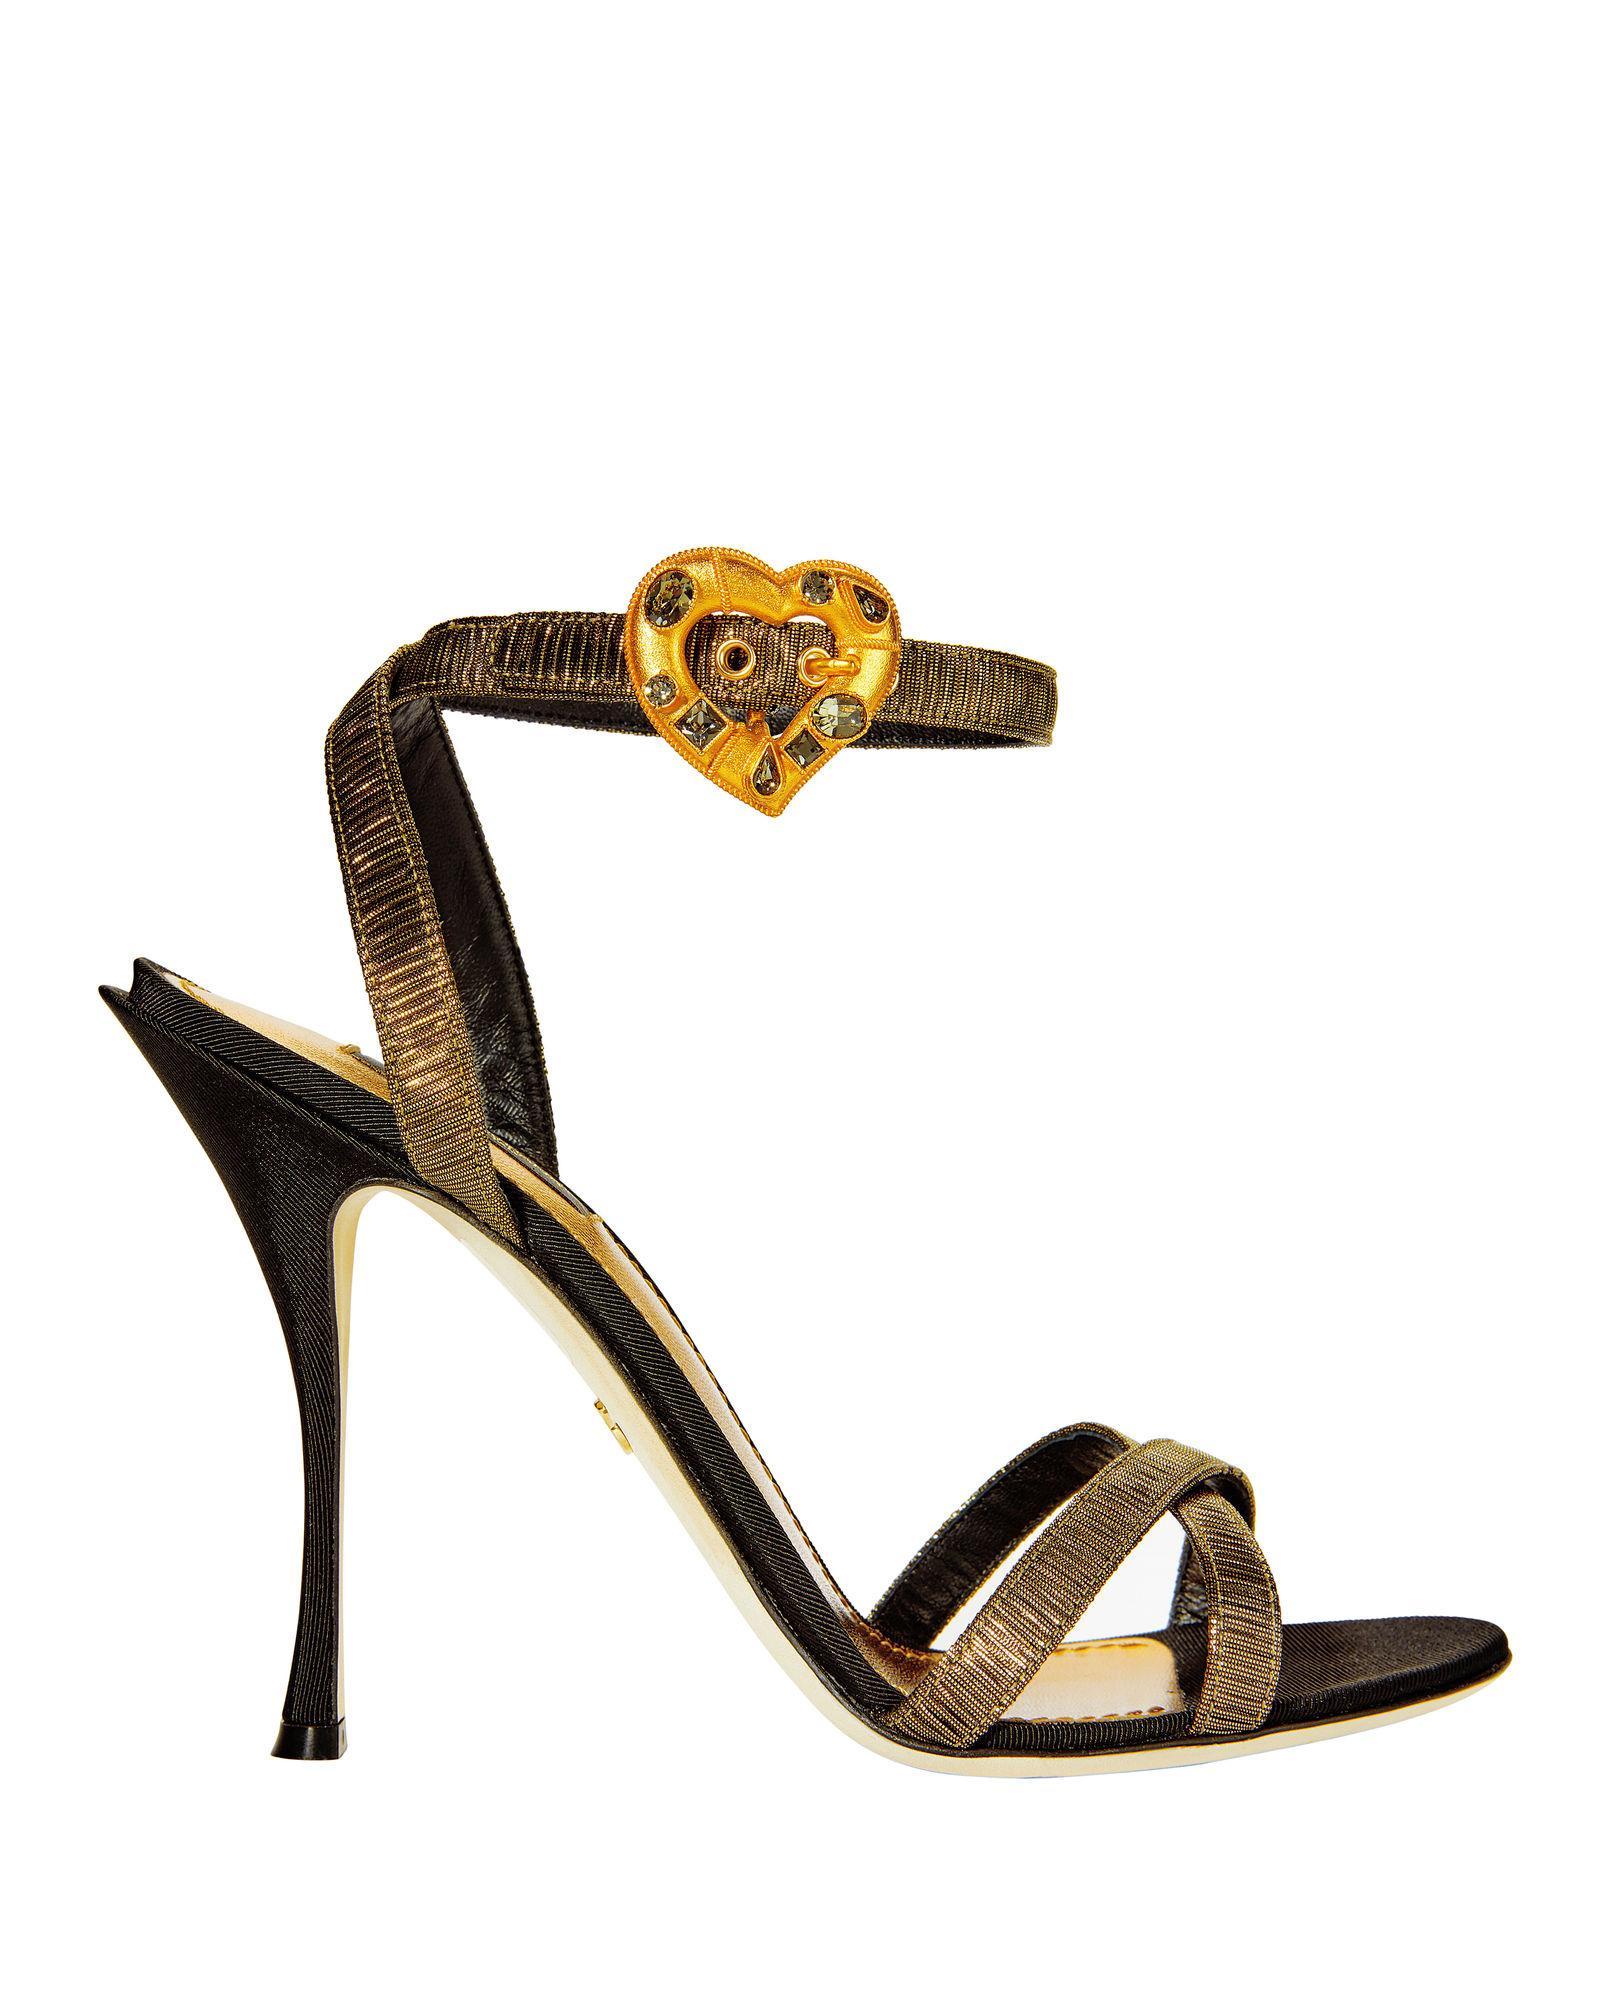 Dolce & Gabbana Gold Lurex Crystal Heart Buckle Sandals Metallic